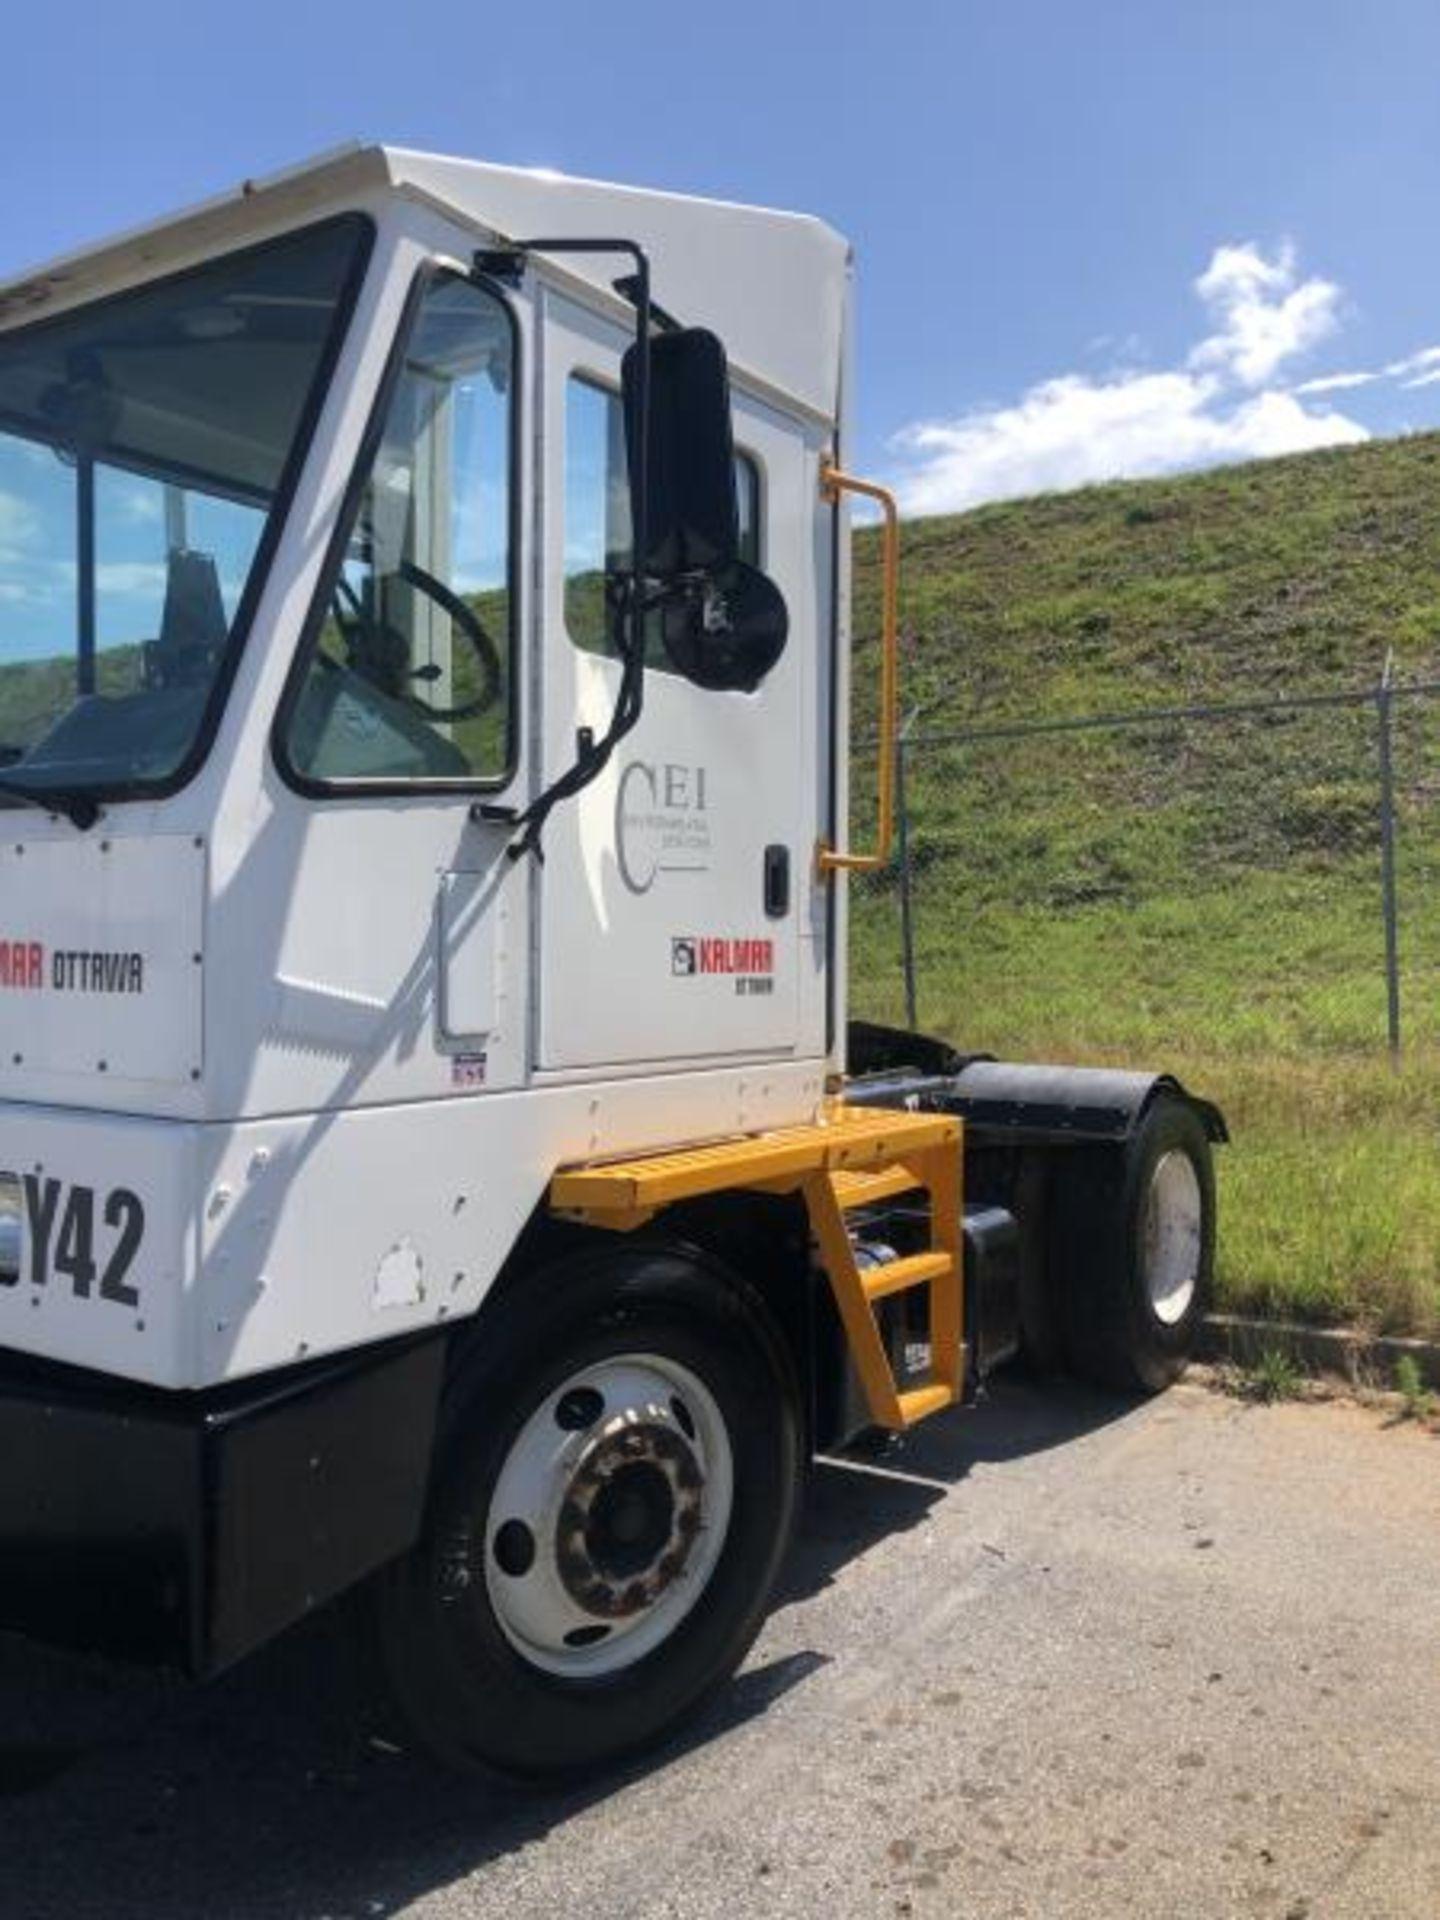 2015 Kalmar Ottawa 4x2 Yard Truck , SN: 338836 1,939.0 Hours, 1,961 Miles - Image 2 of 33